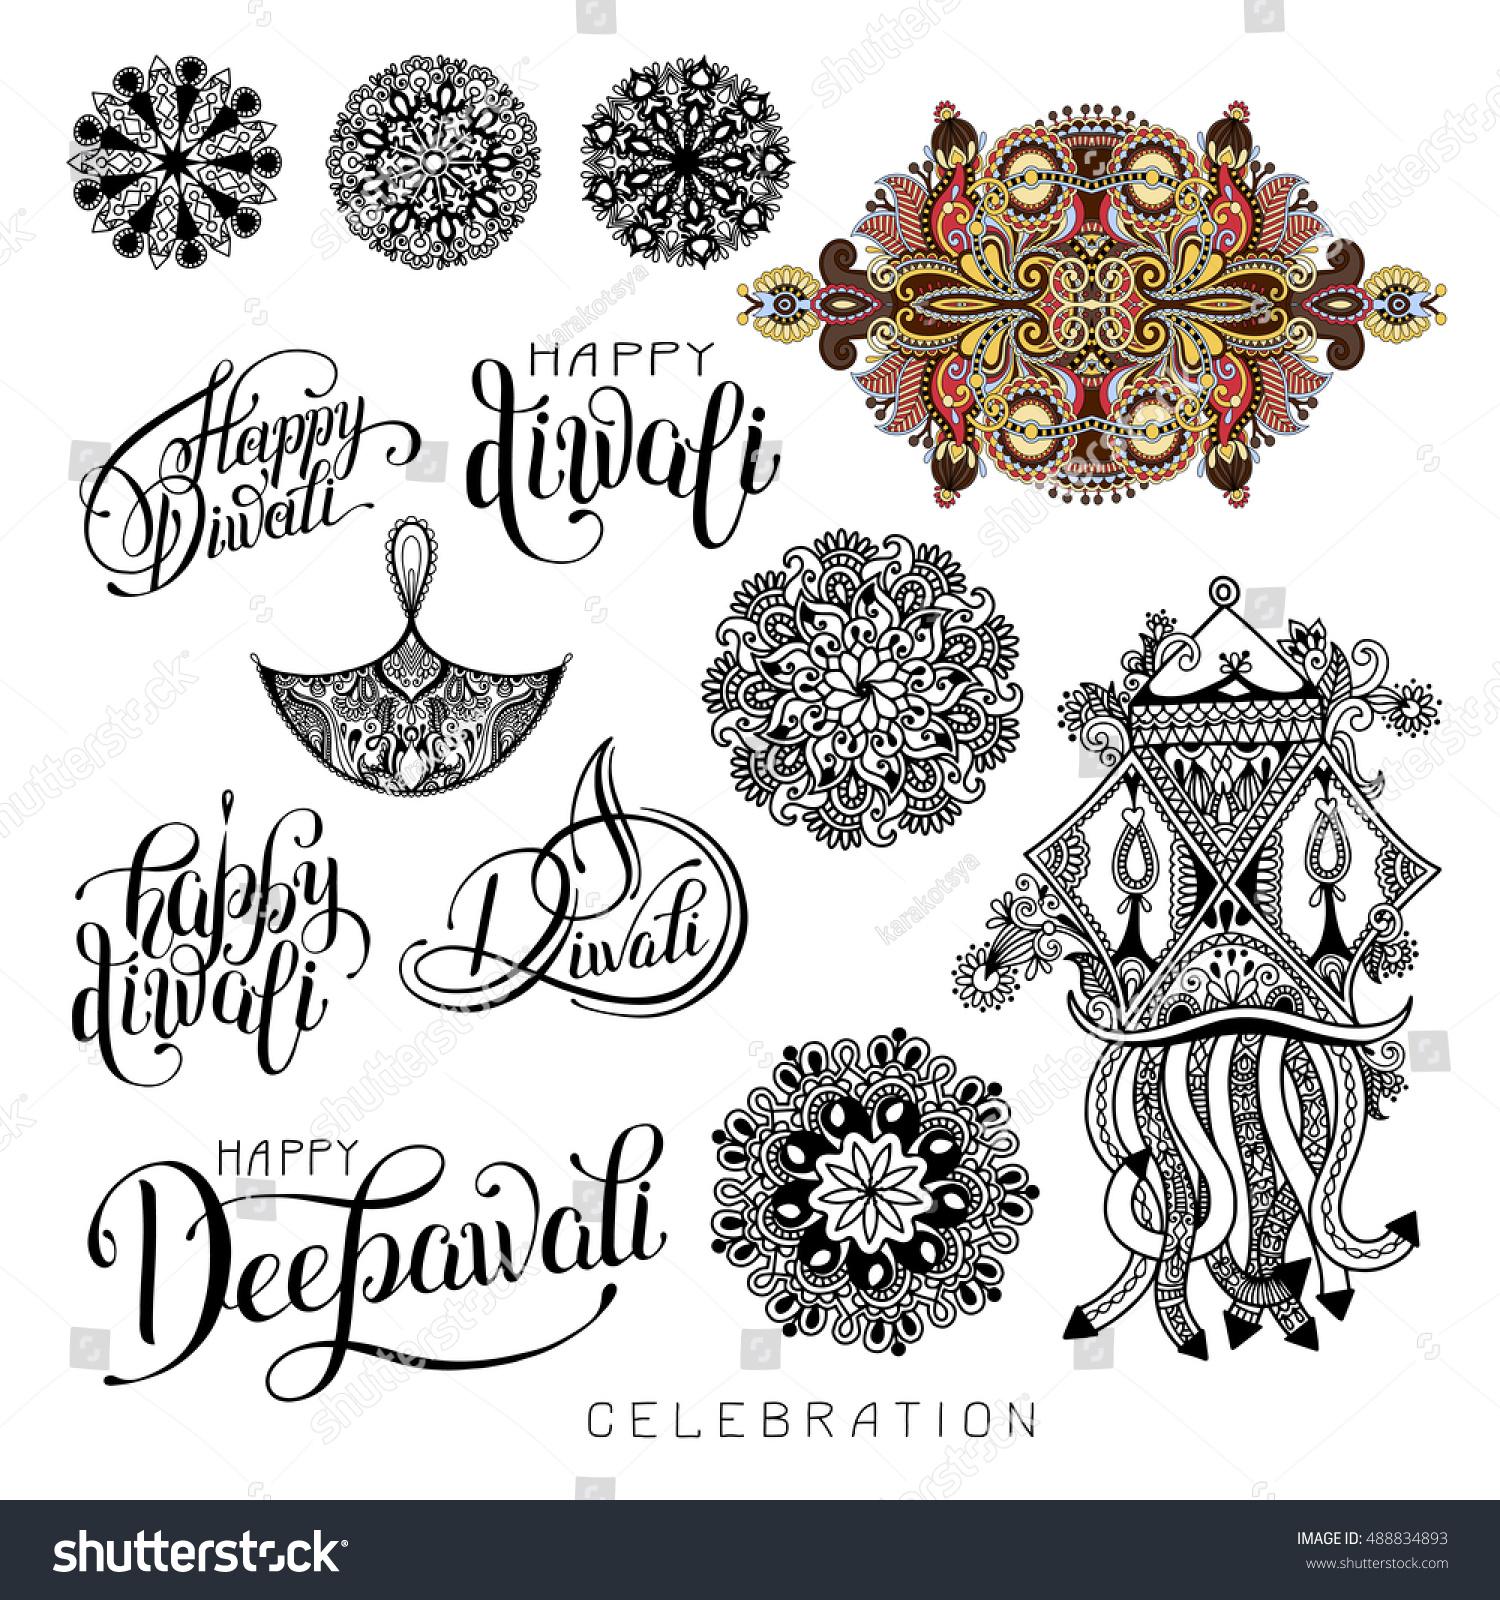 Set Black White Hand Drawing Design Stock Vector (2018) 488834893 ... for diwali festival black and white images  111ane